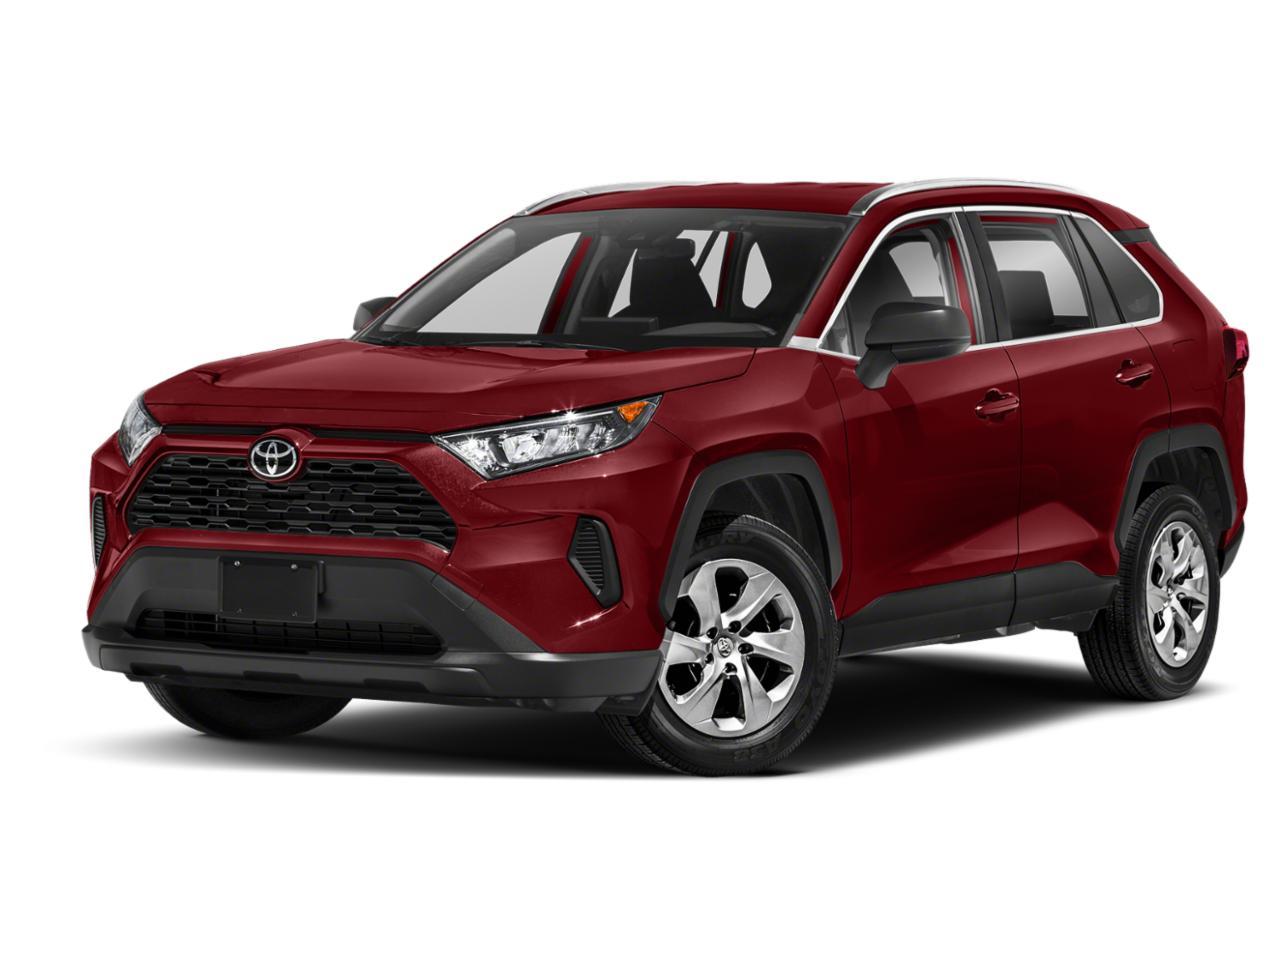 2019 Toyota RAV4 Vehicle Photo in Owensboro, KY 42303